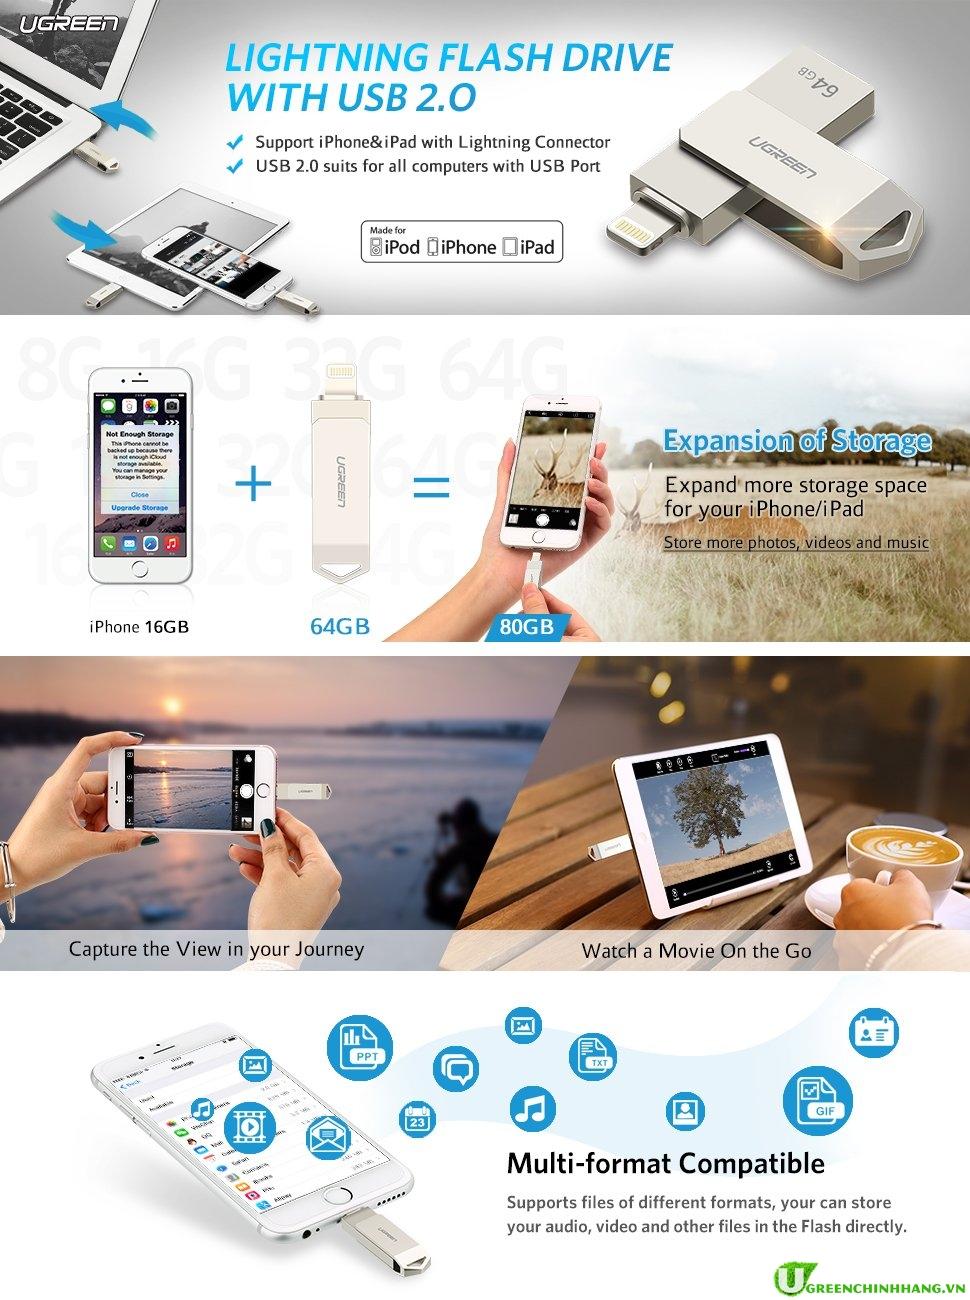 bo-luu-tru-gan-ngoai-usb-flash-2-0-danh-cho-iphone-va-ipad-32gb-ugreen-30616